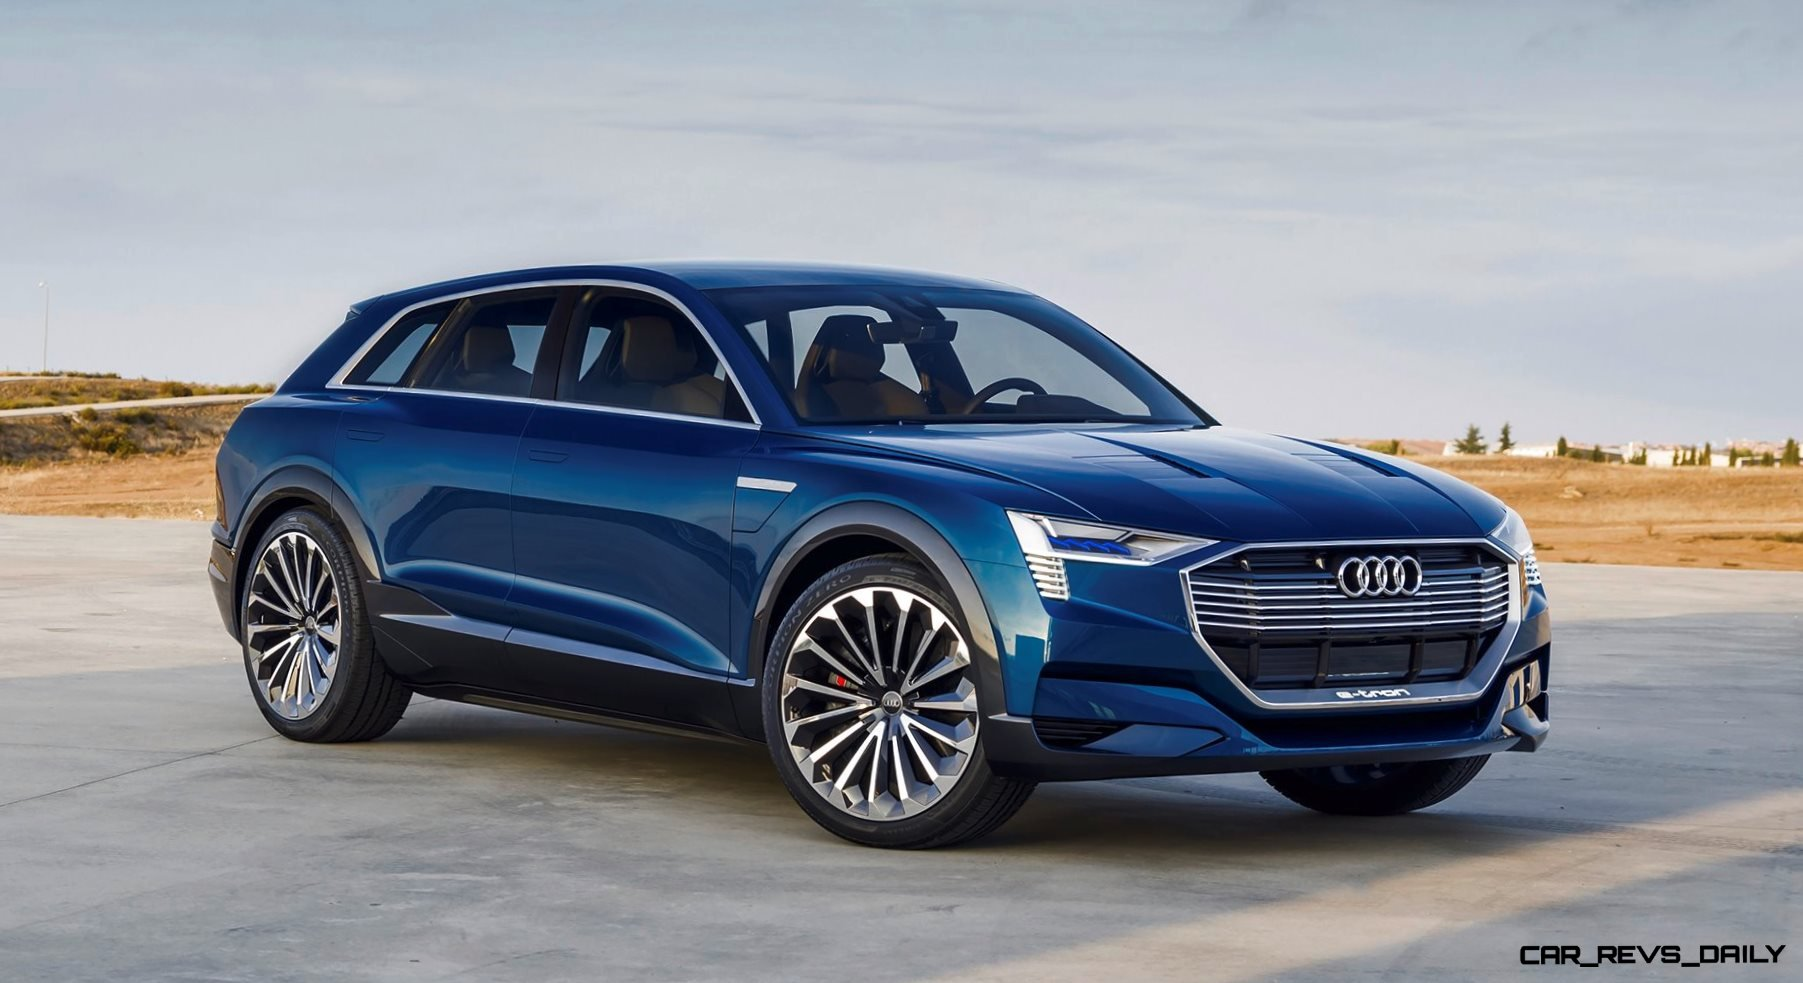 2015 Audi e-tron Quattro and TT Clubsport Turbo Concepts Grace Future Performance Event